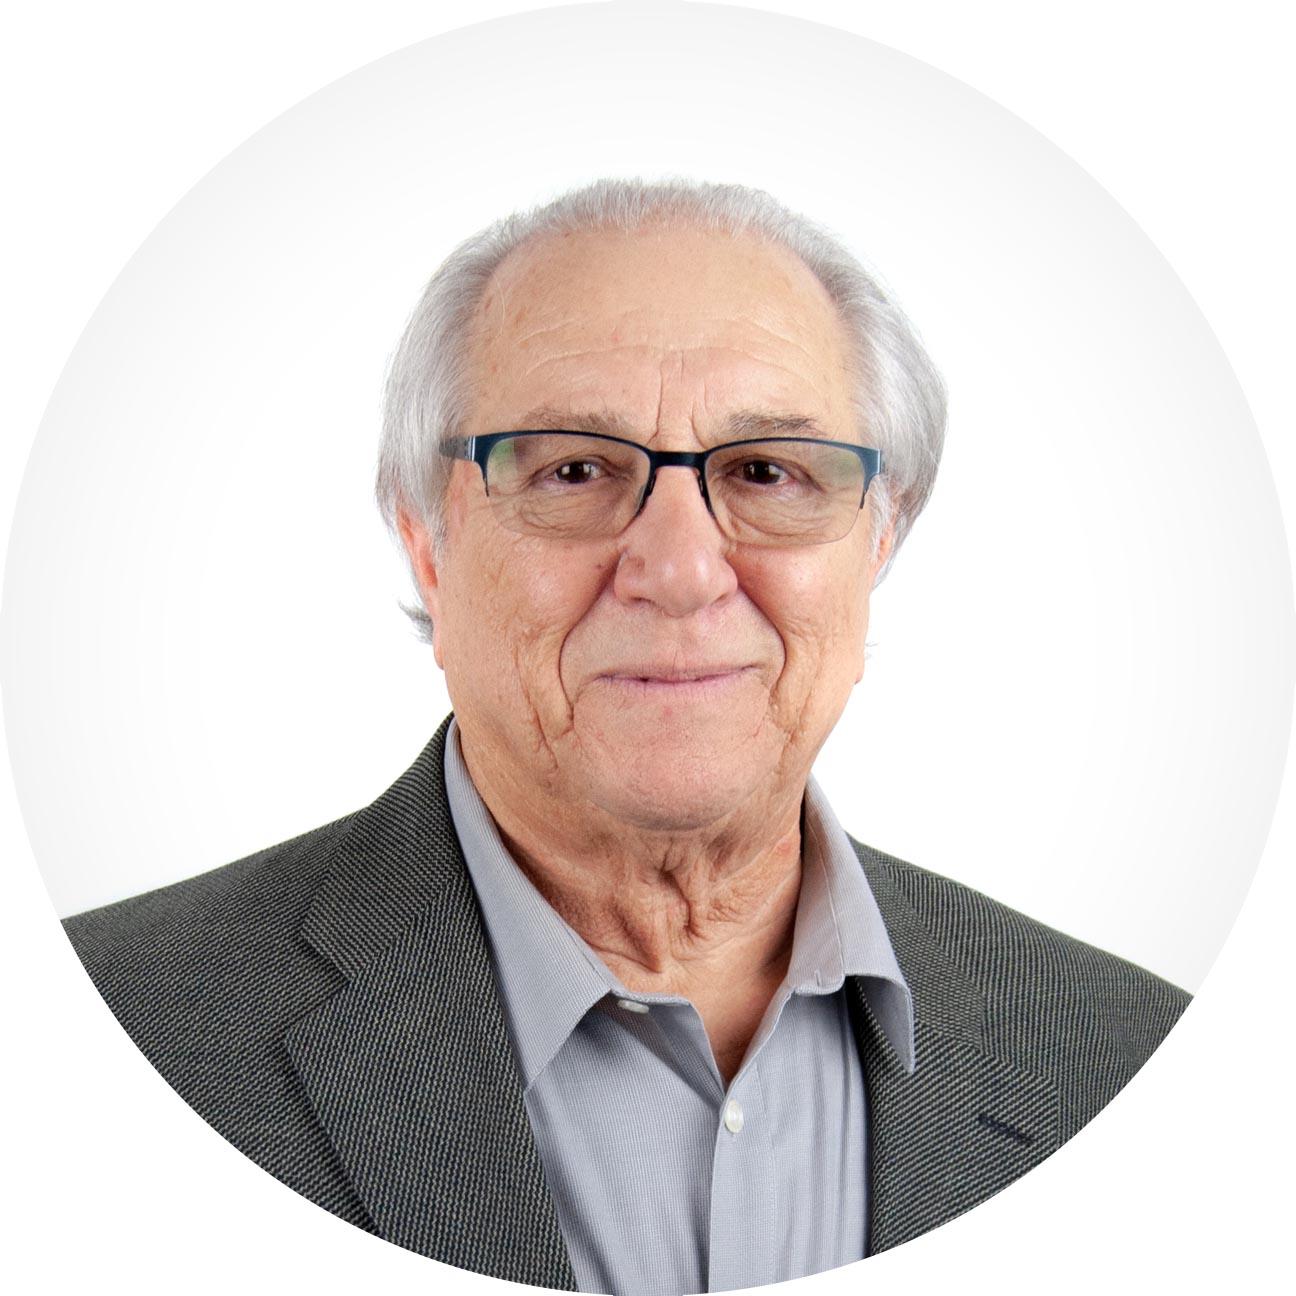 Ronald J. Consiglio